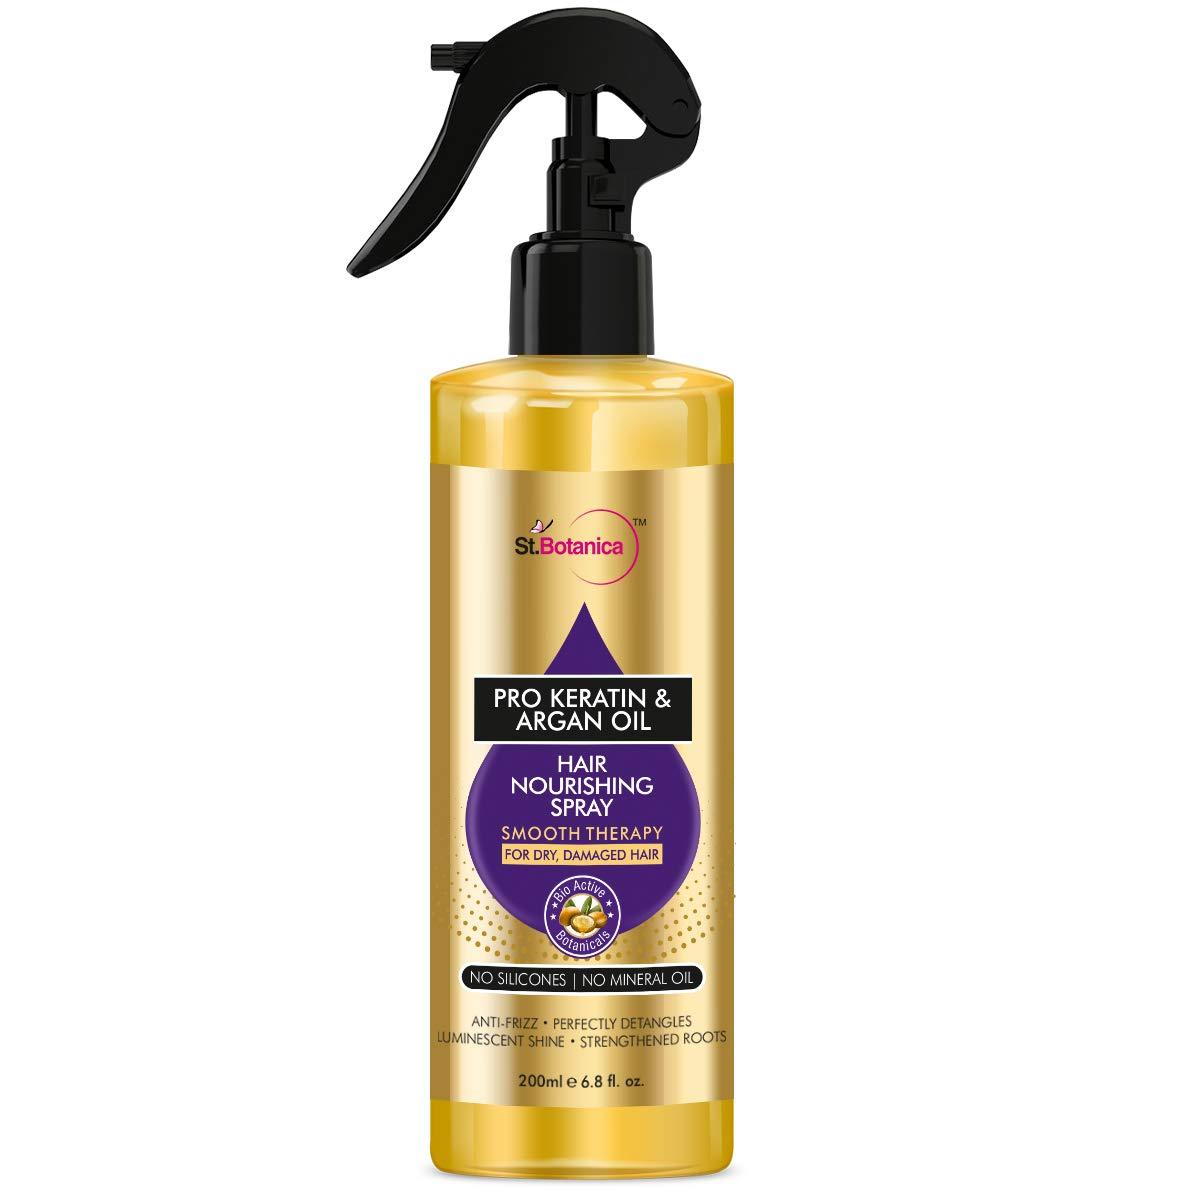 StBotanica Pro-Keratin & Argan Oil Hair